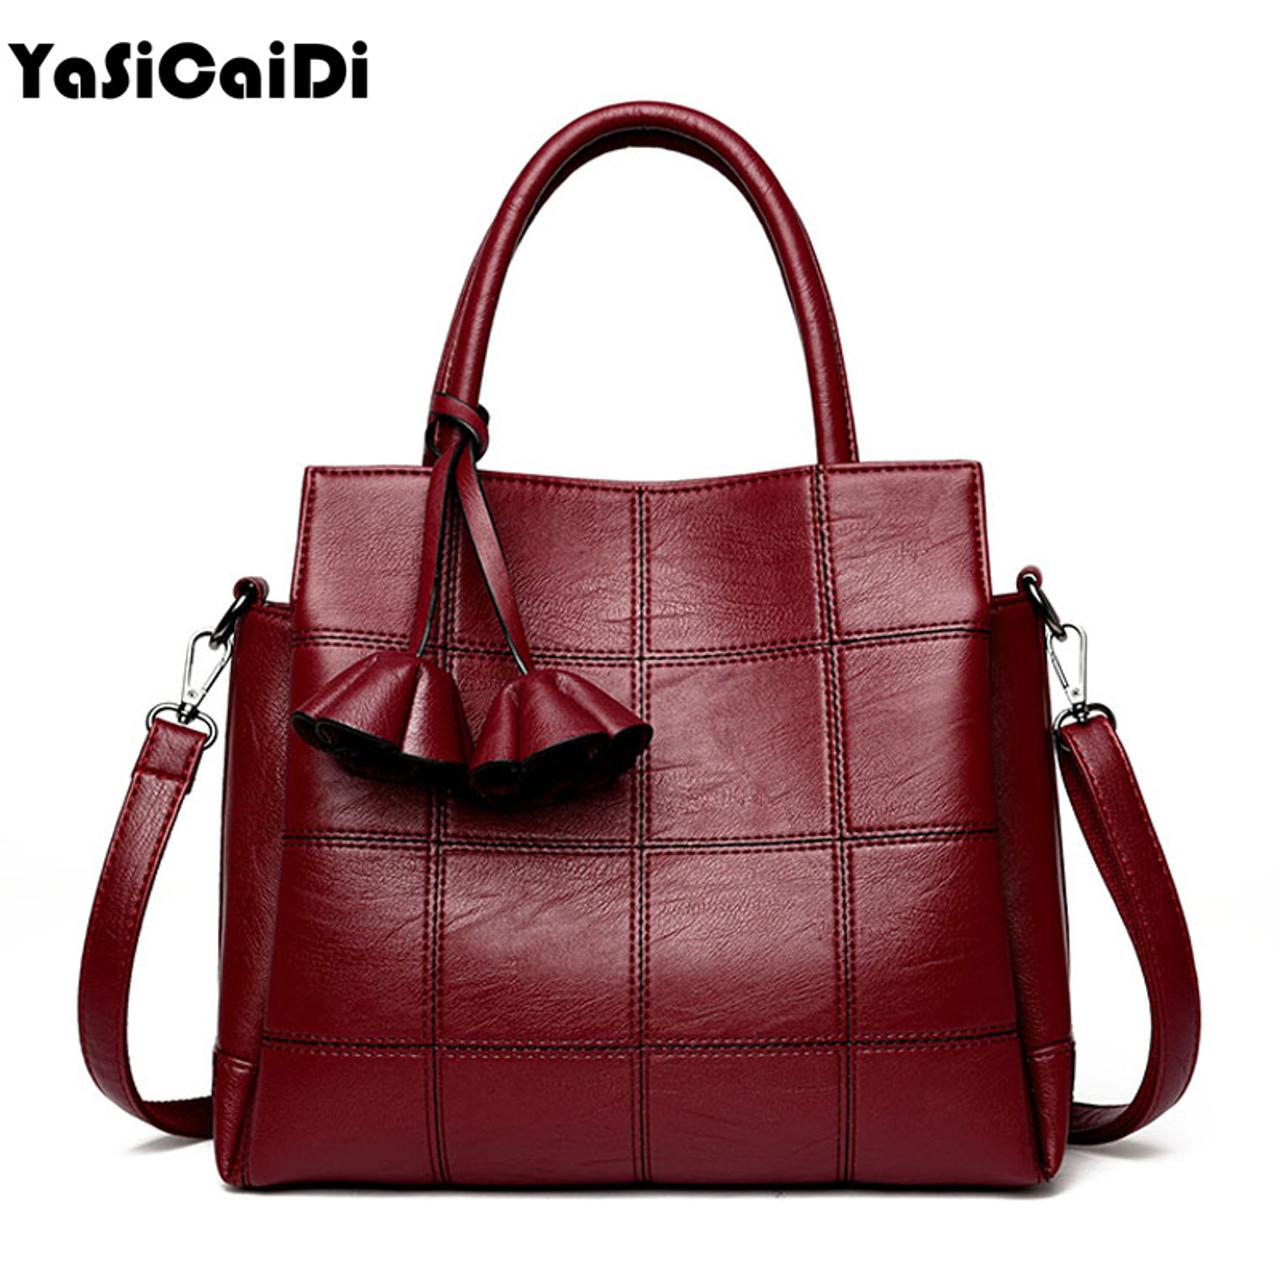 62167aca8c70 YASICAIDI Fashion Pu Leather Women Shoulder Bags Famous Designer Vintage  Tassel Large Women Messenger Bags Ladies Tote Bags Sac